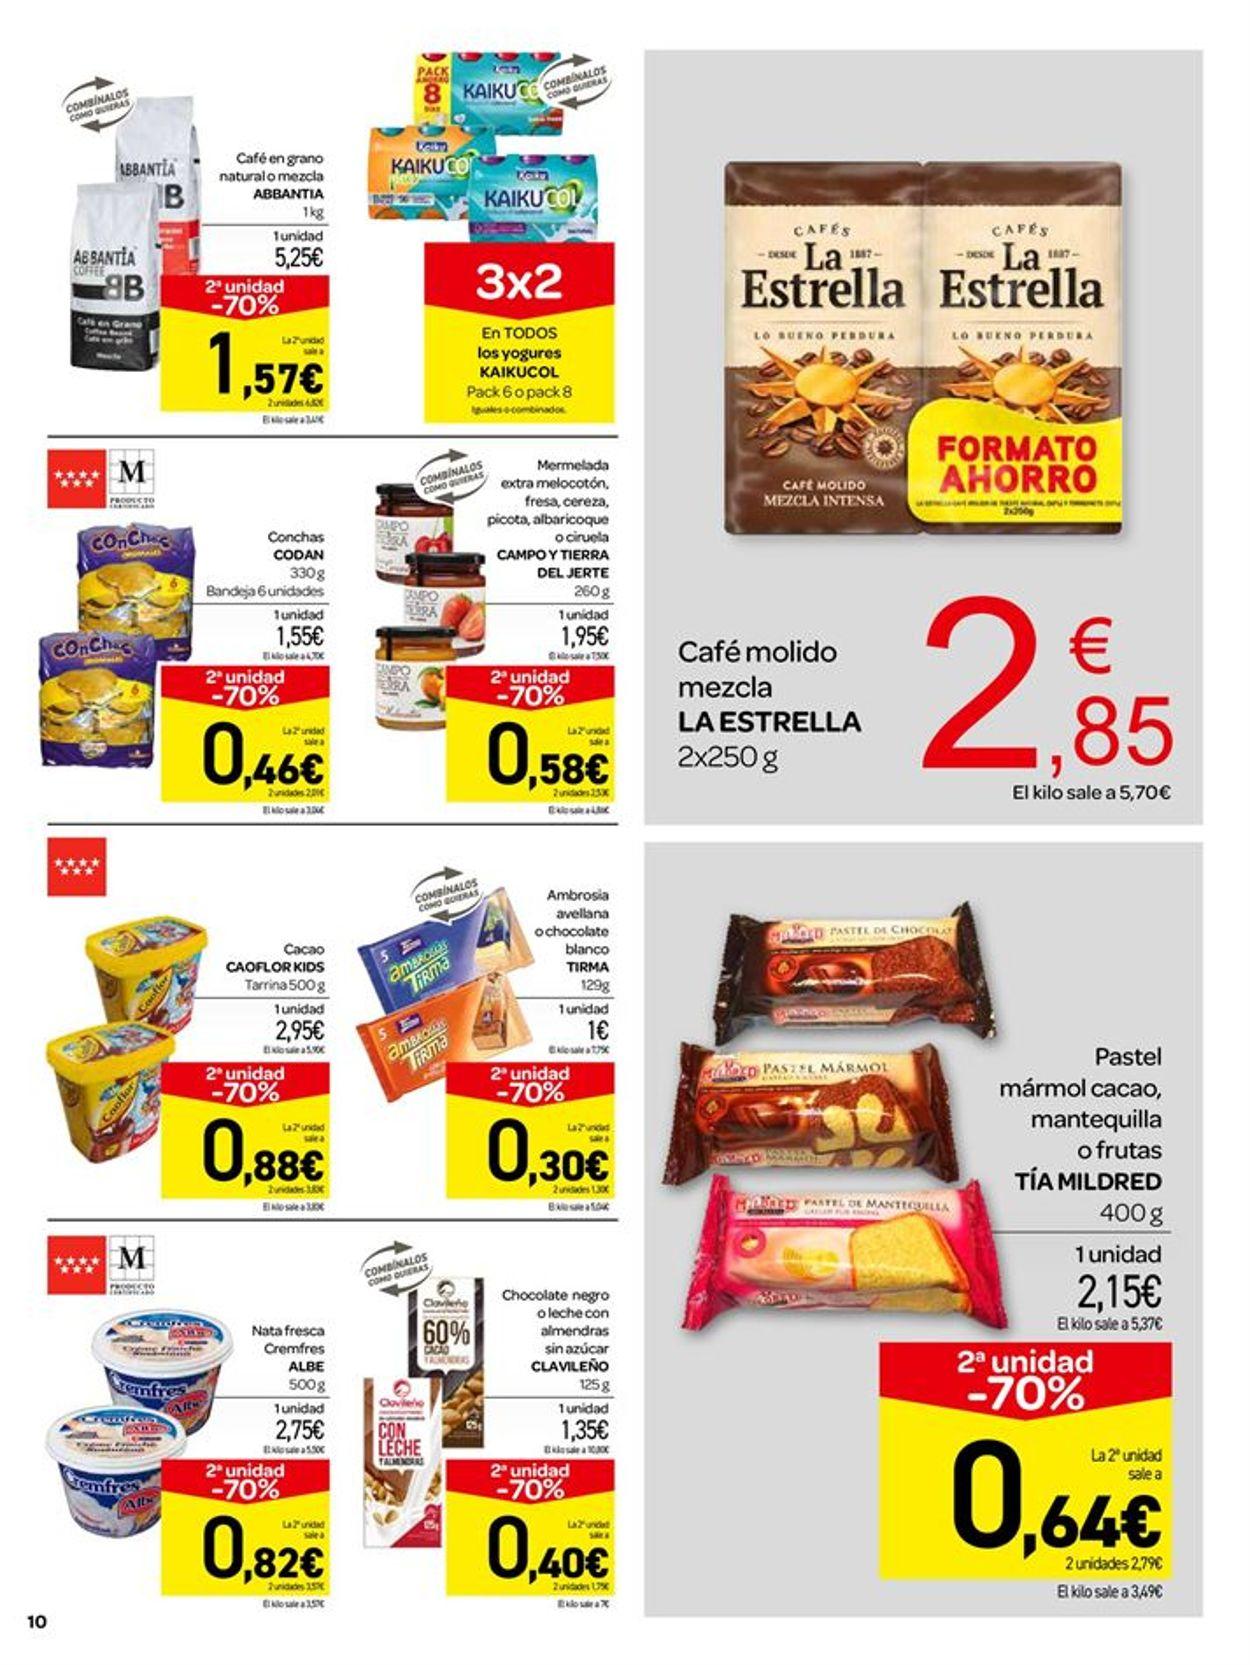 Carrefour Folleto - 10.07-24.07.2019 (Página 10)